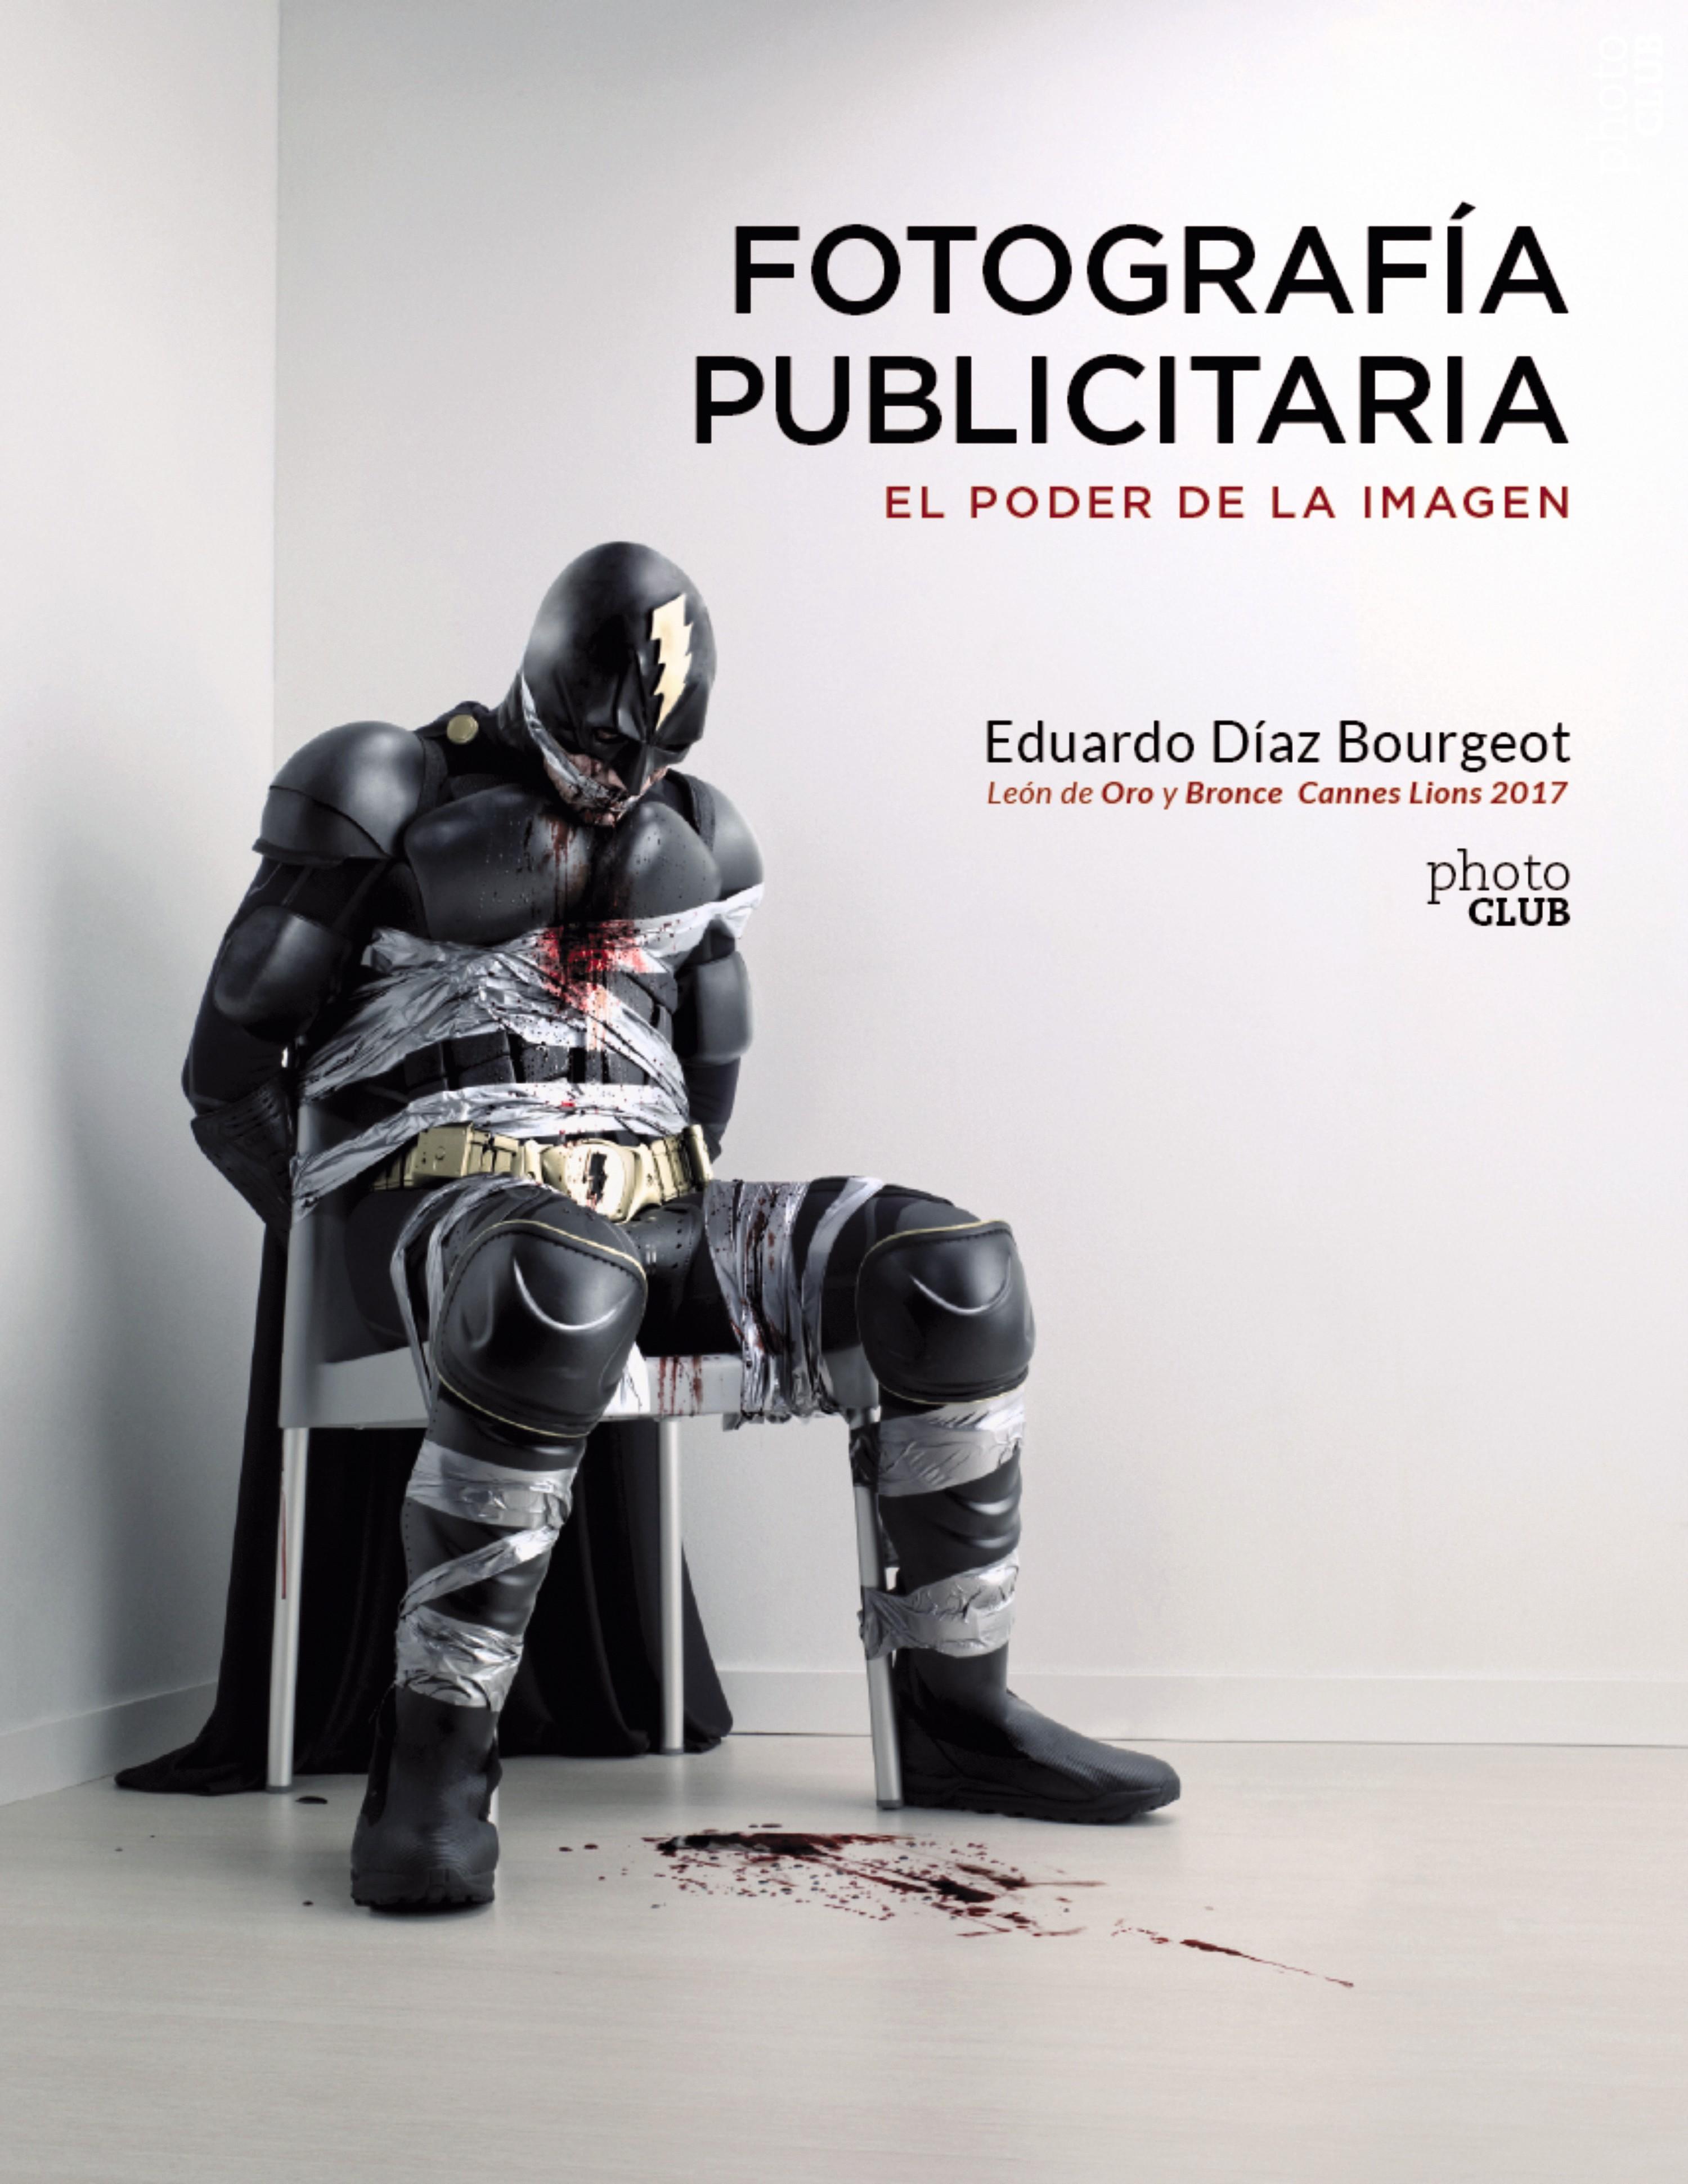 Fotografía publicitaria El poder de la imagen, Eduardo Díaz Bourgeot, 2017.